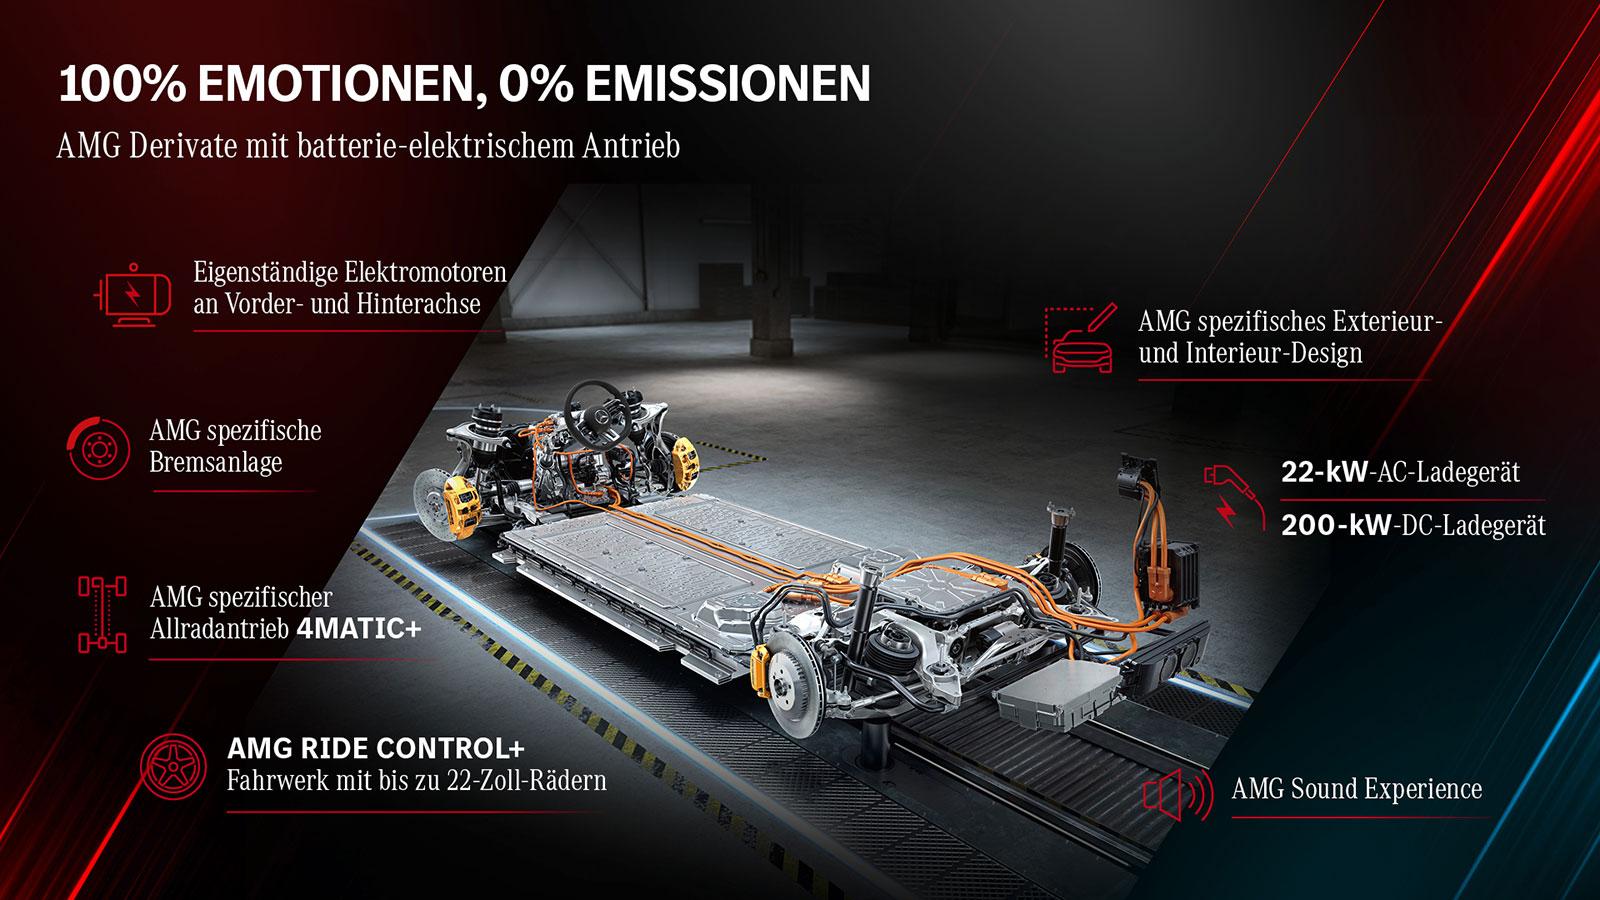 Mercedes-AMG-Elektro-Strategie-2021-4